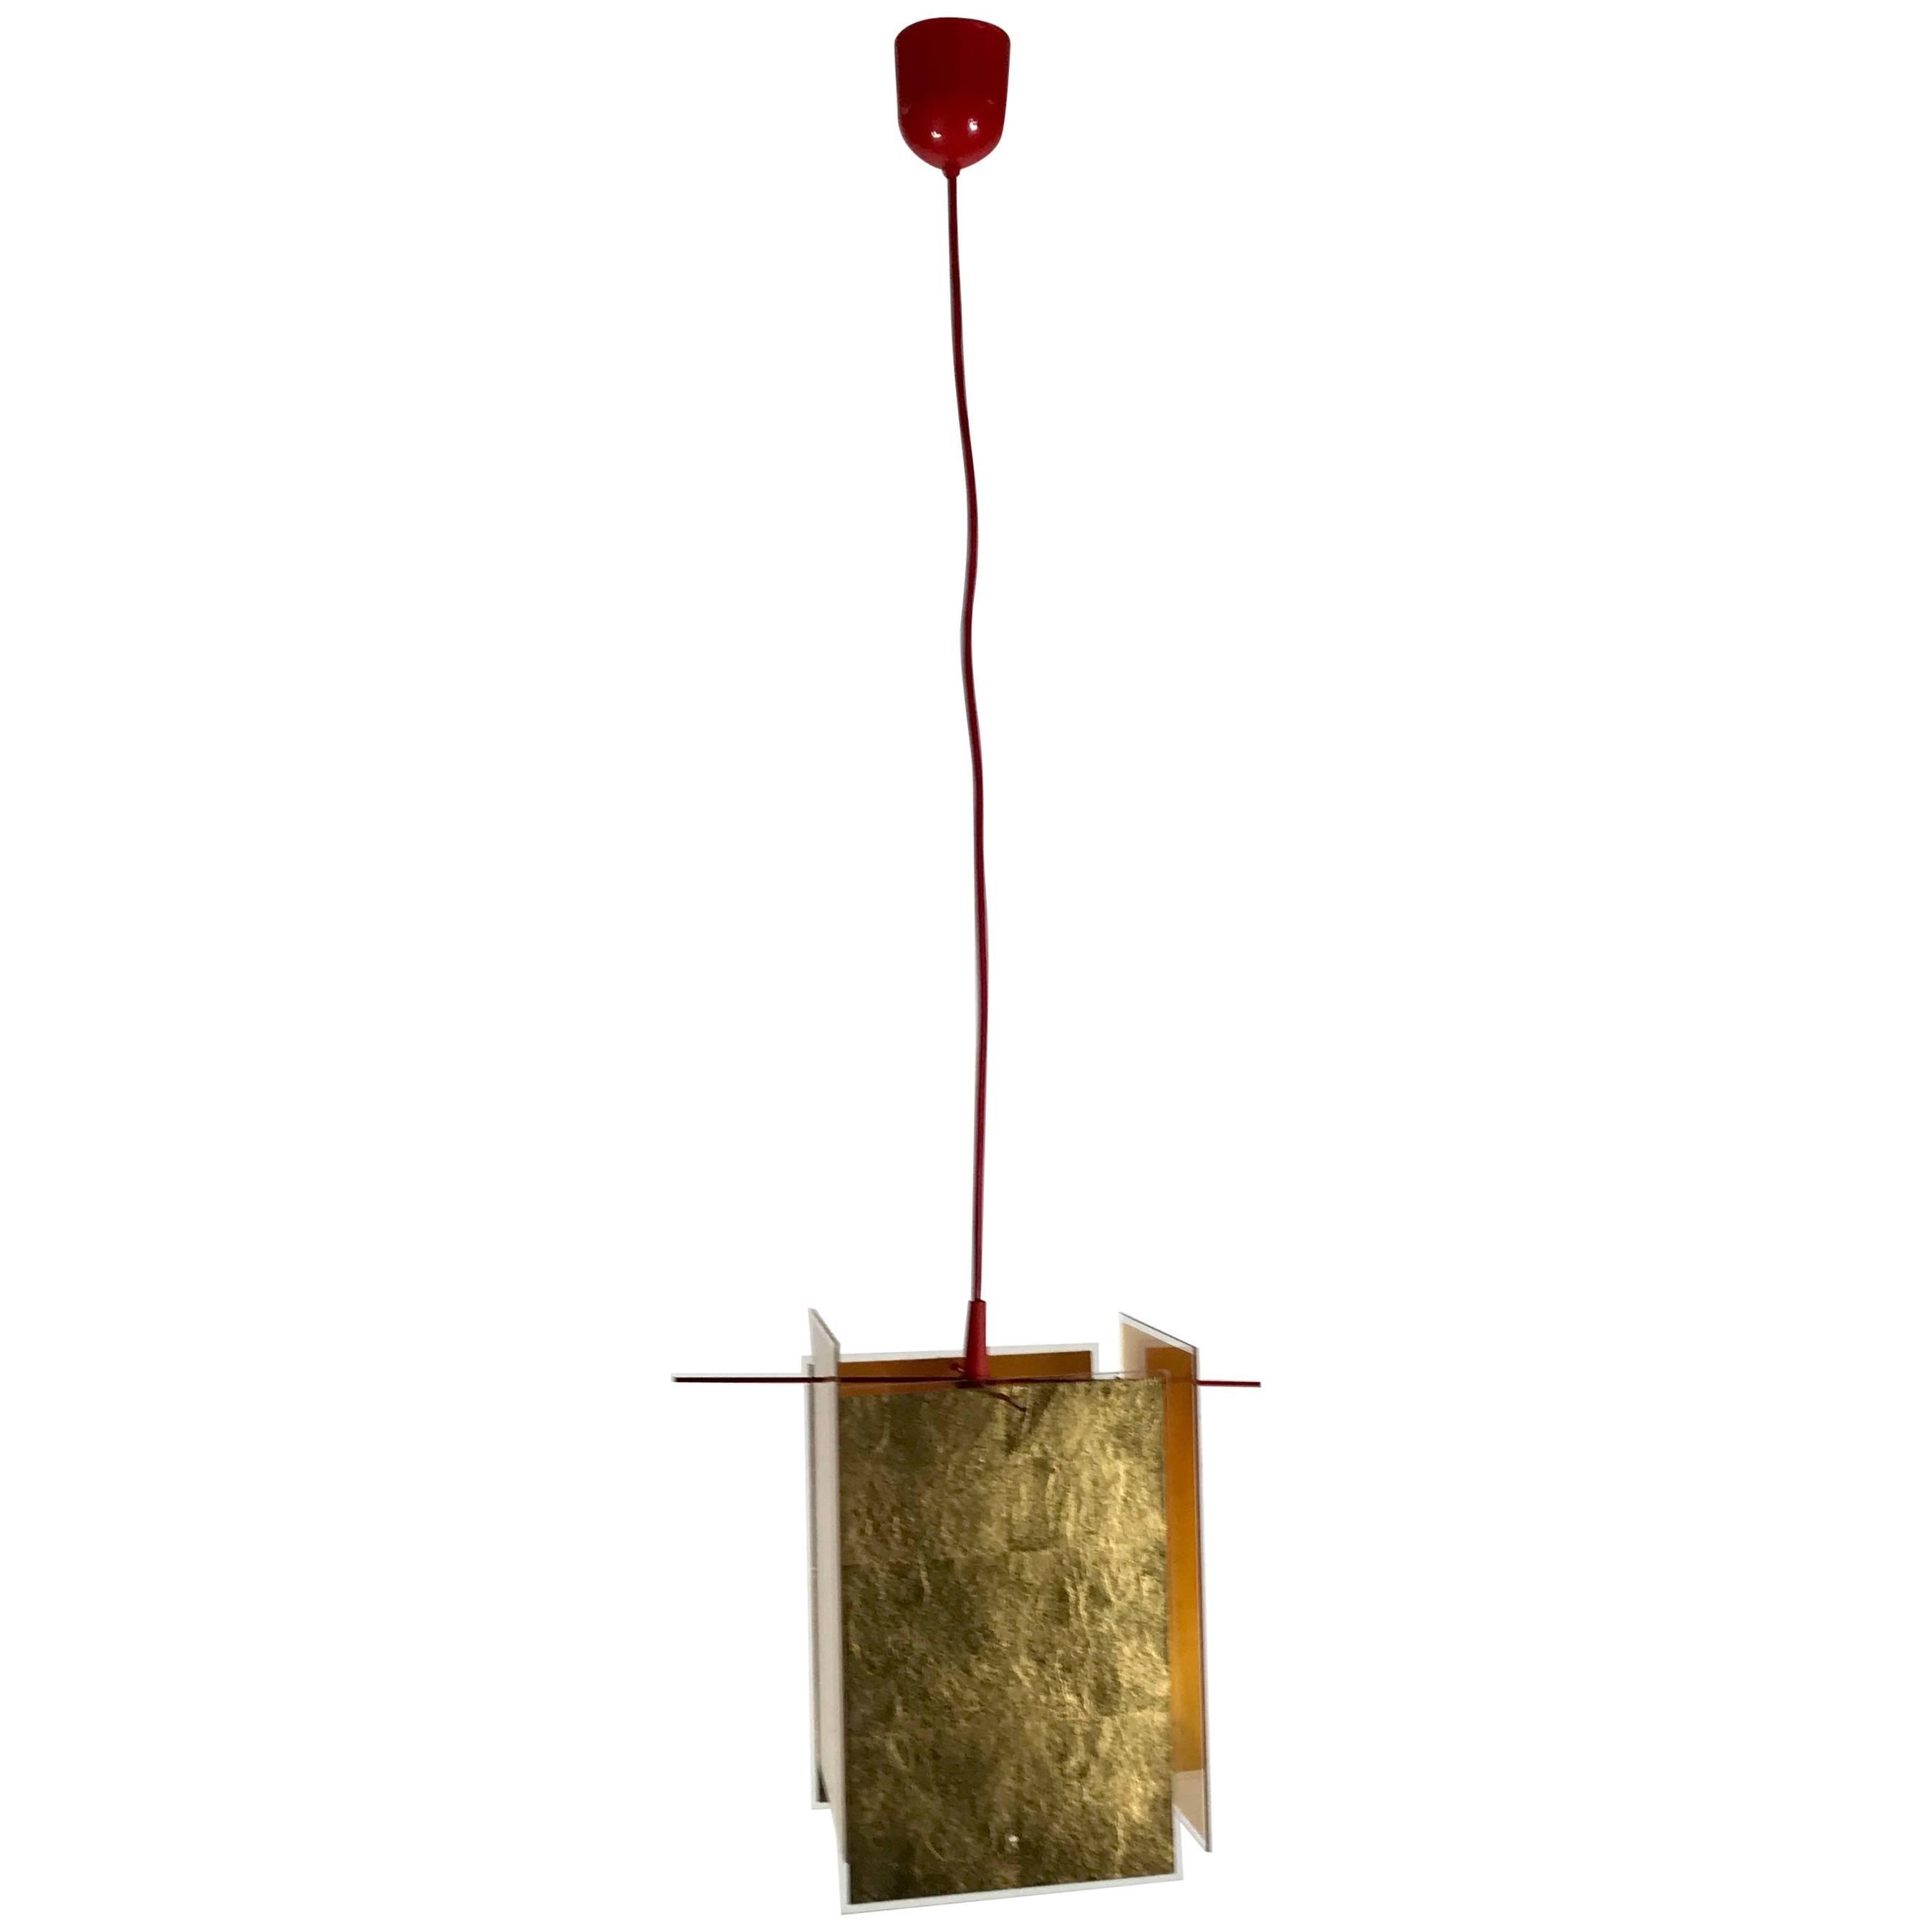 Ingo Maurer 24 Karat Blau Pendant Lamp, Contemporary Modern, Germany For  Sale